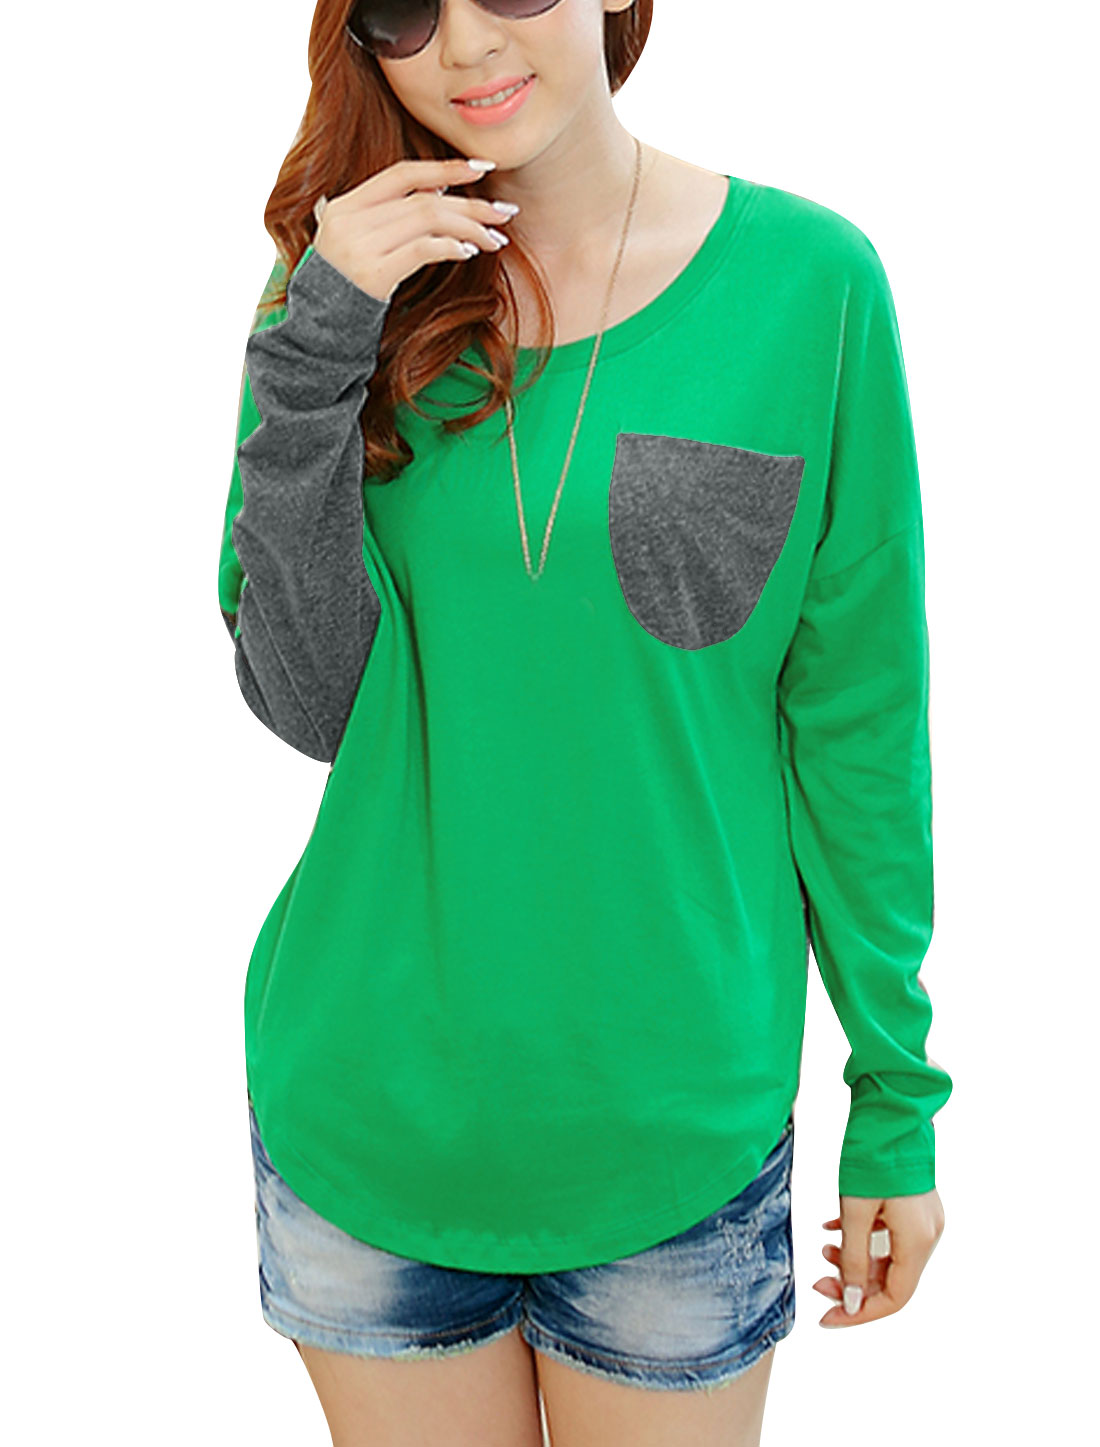 Women Batwing Sleeve Pullover Loose Tee Shirt Green Gray S